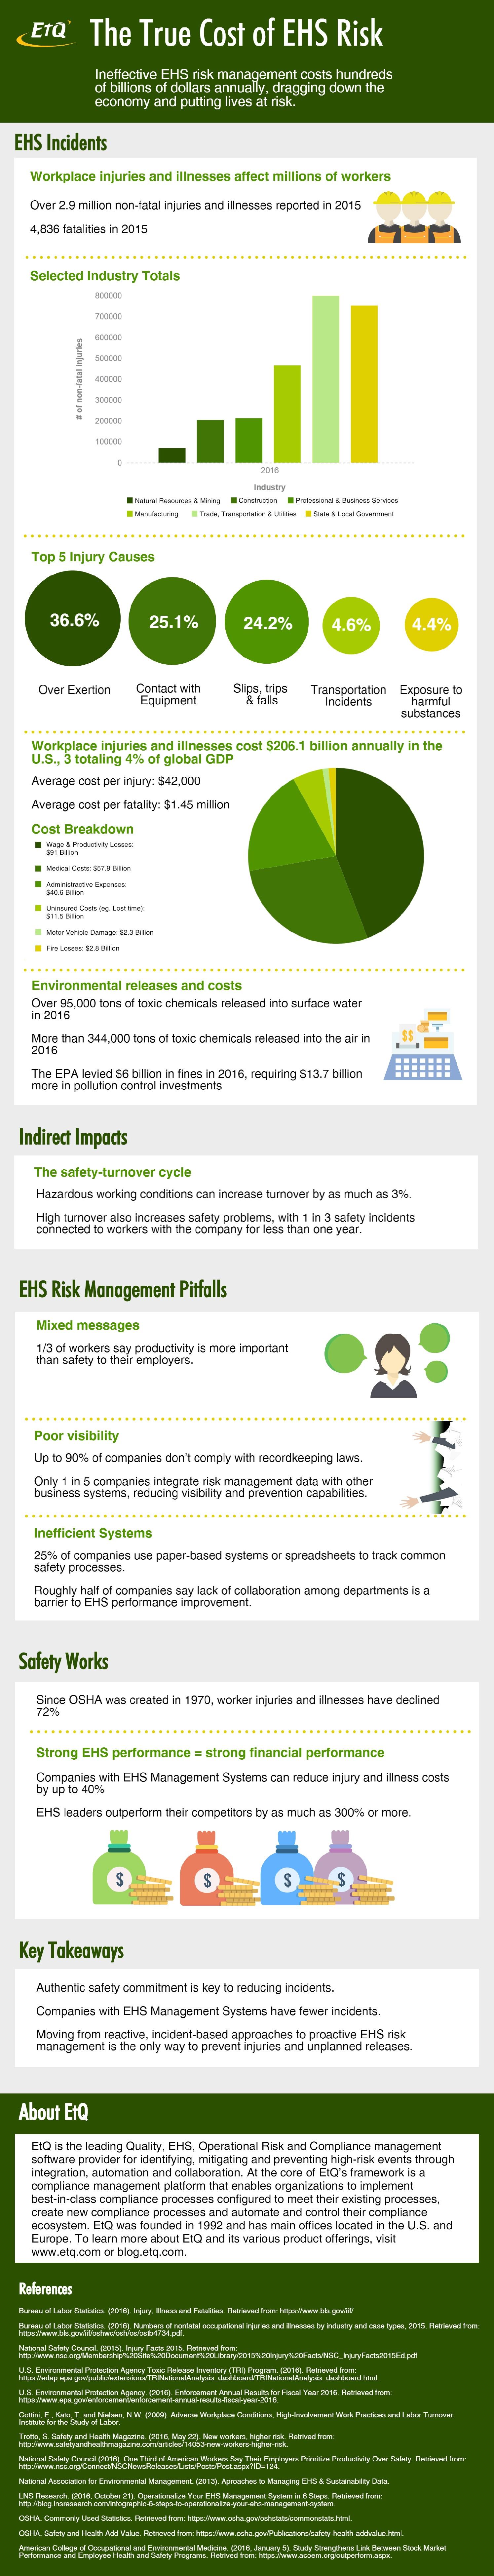 ehs-risk_Nov 8 Final updated copy.jpg